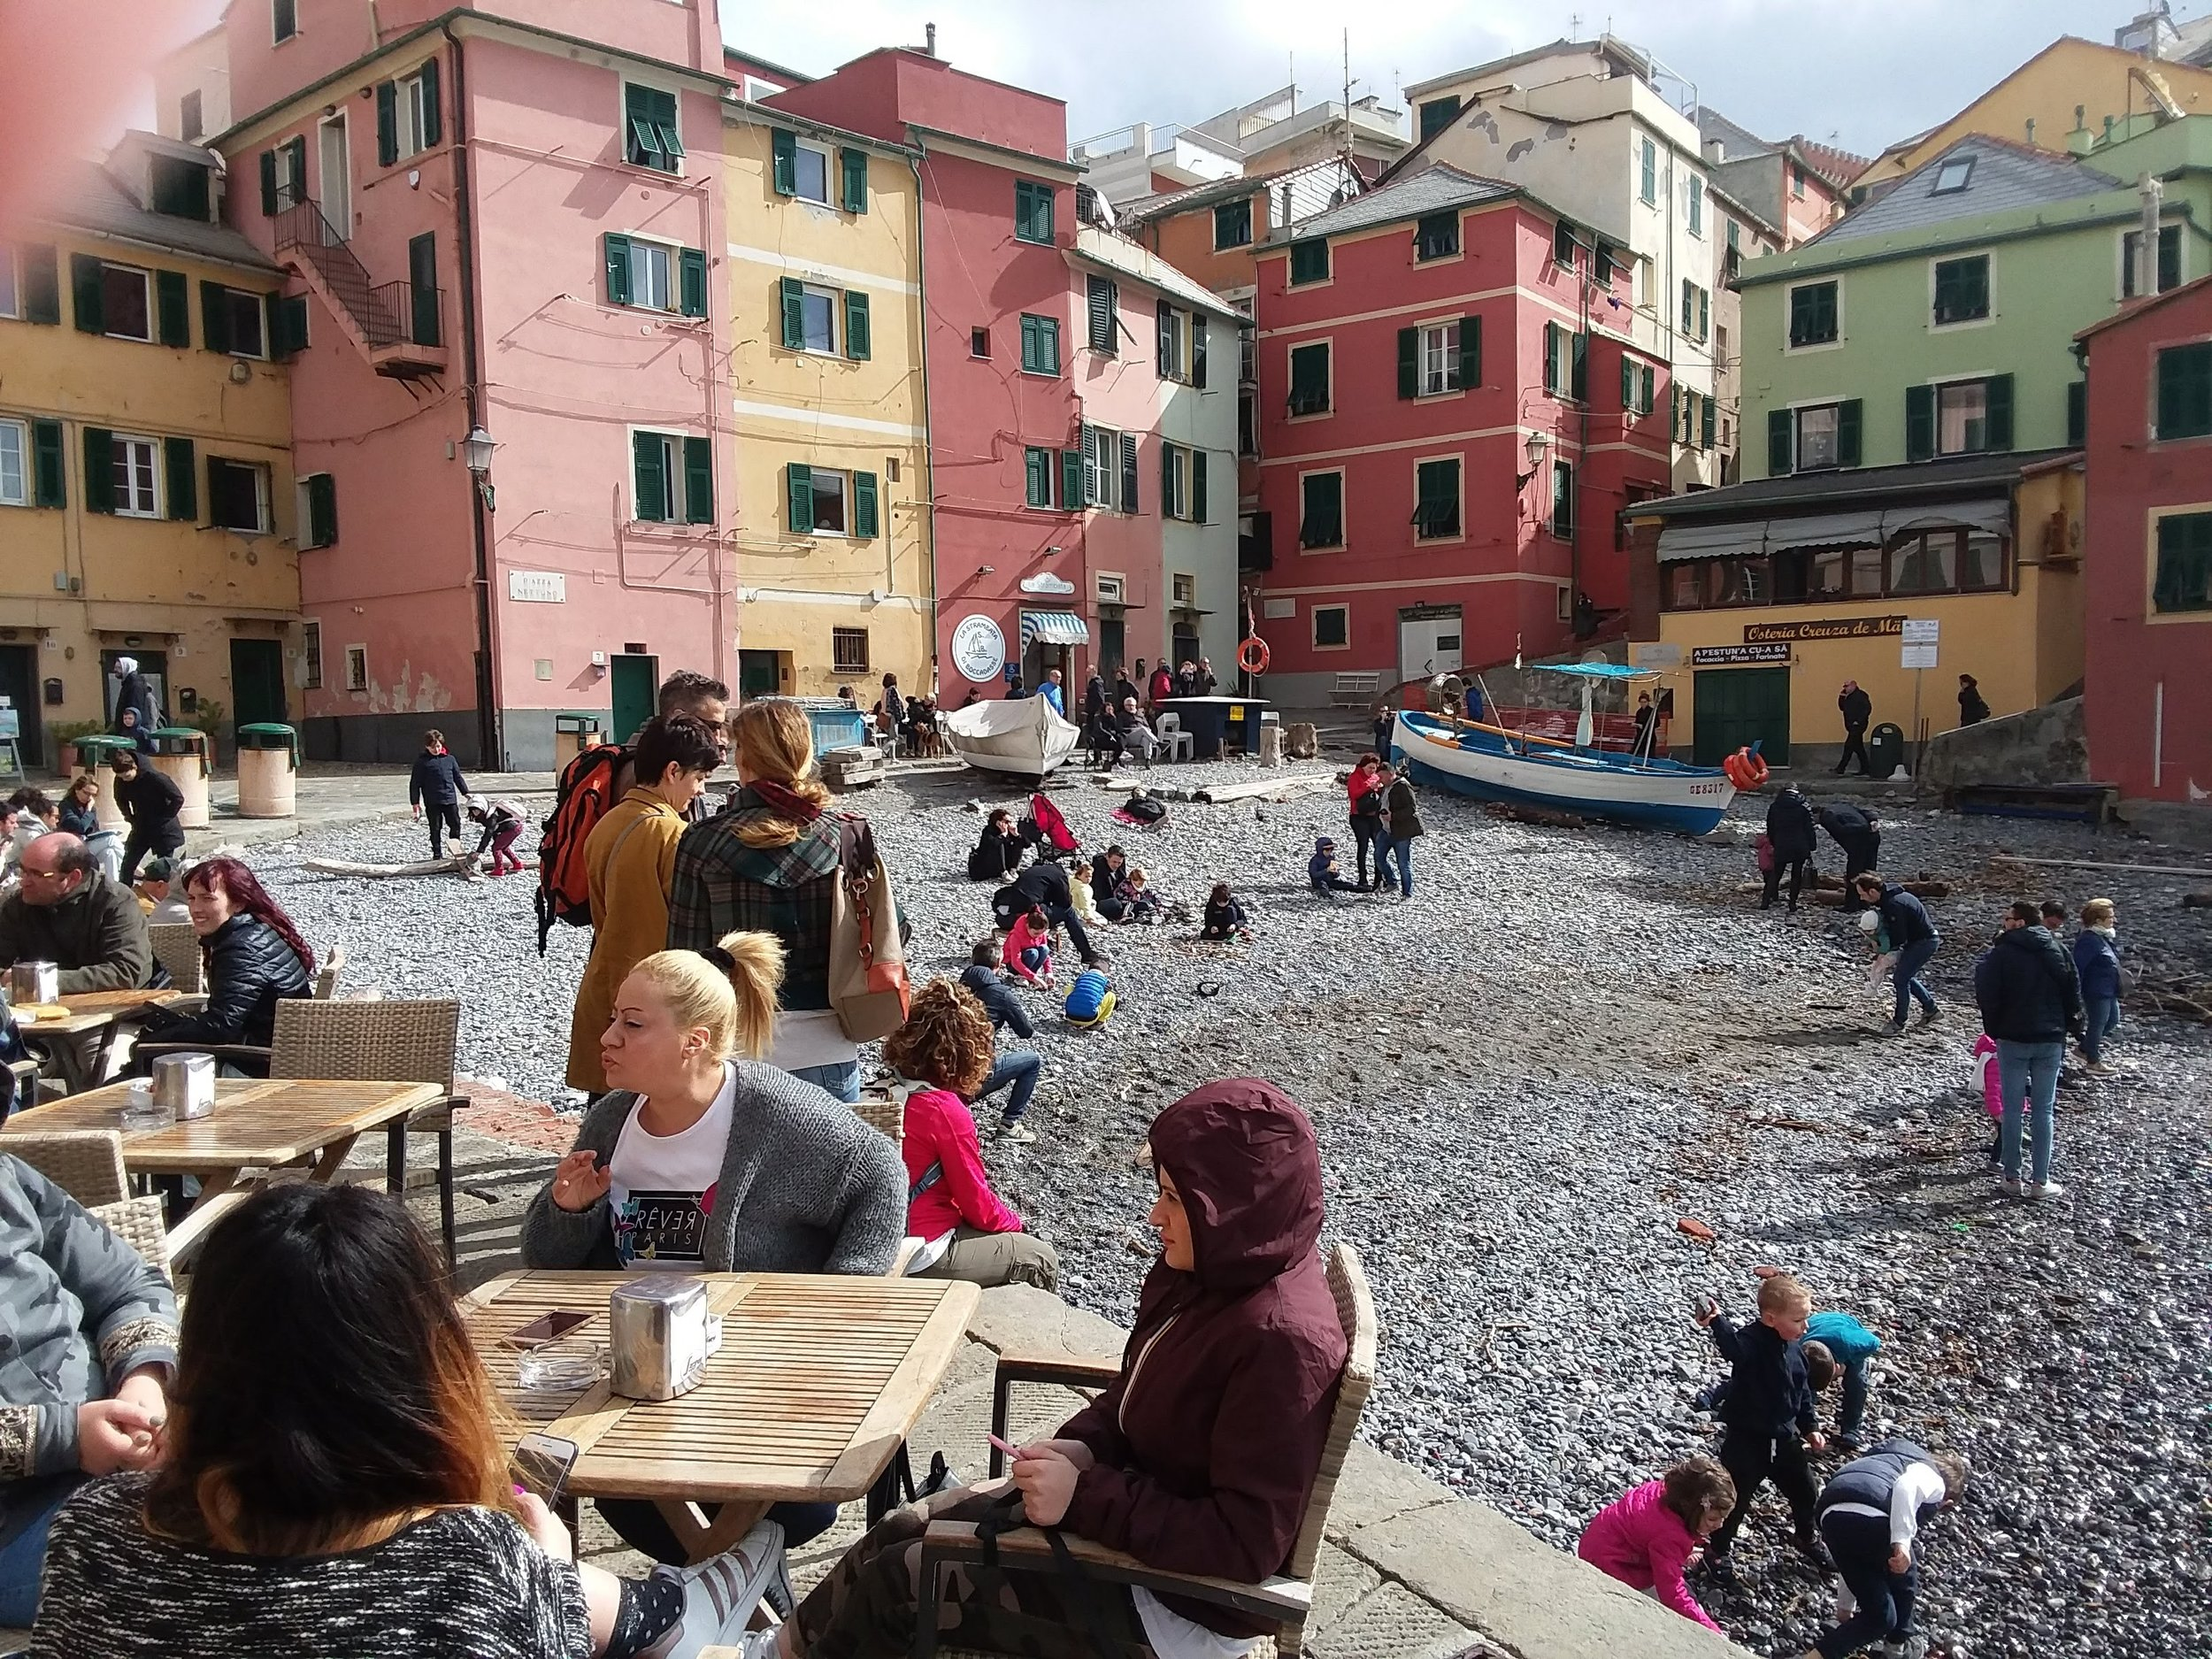 café life alive in the boccadasse